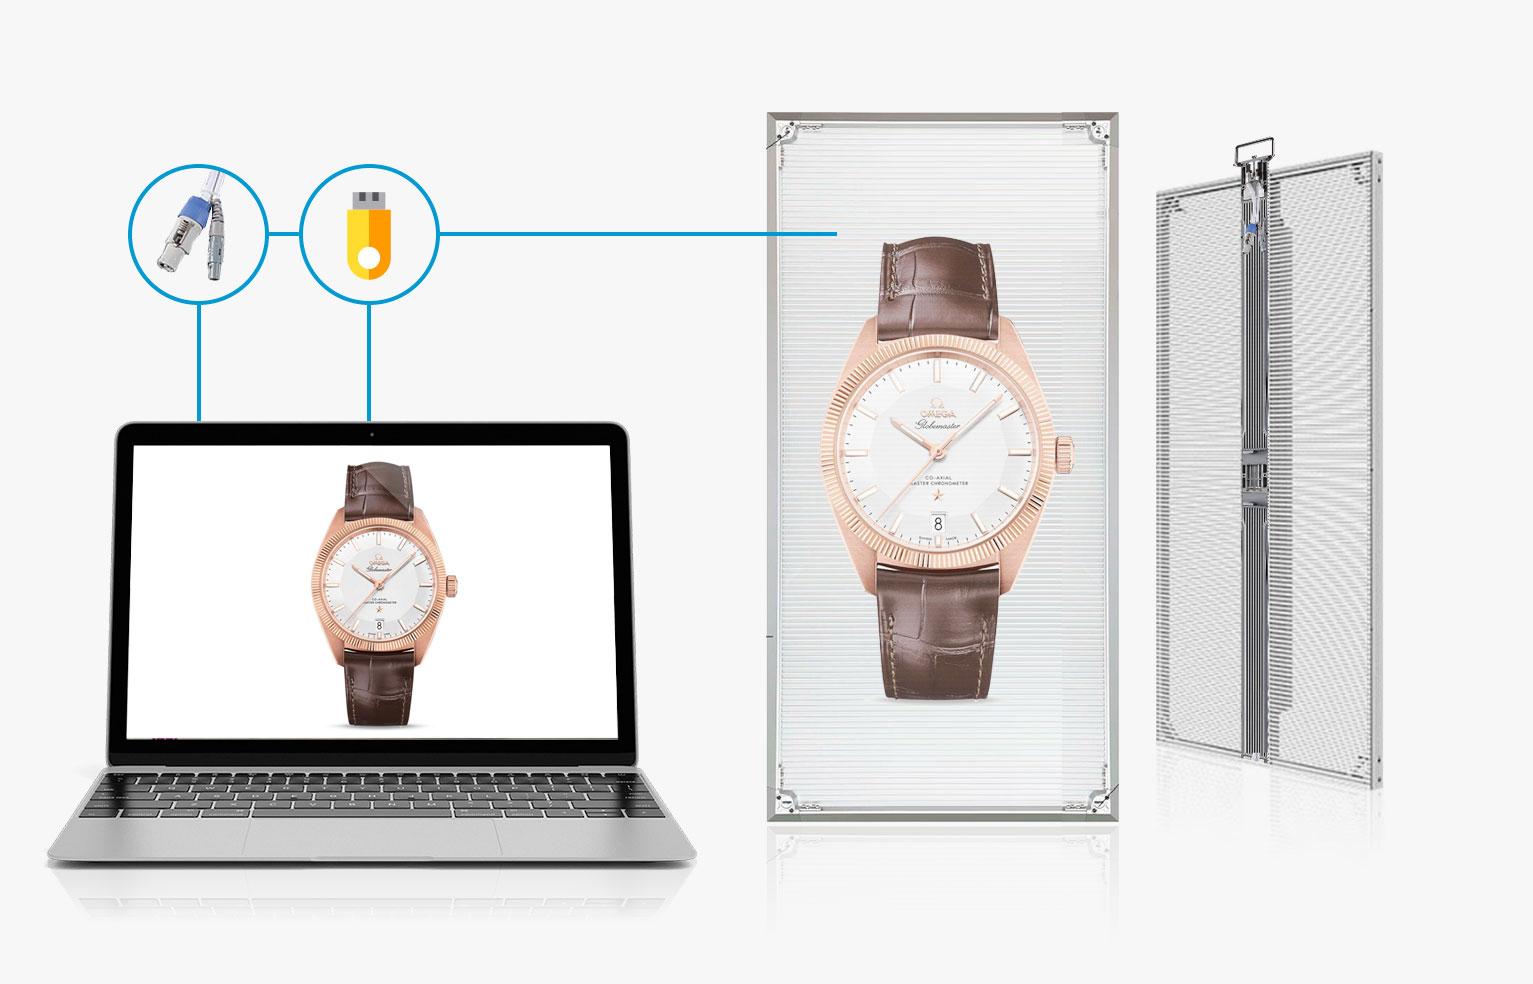 Conexiones pantallas LED transparentes